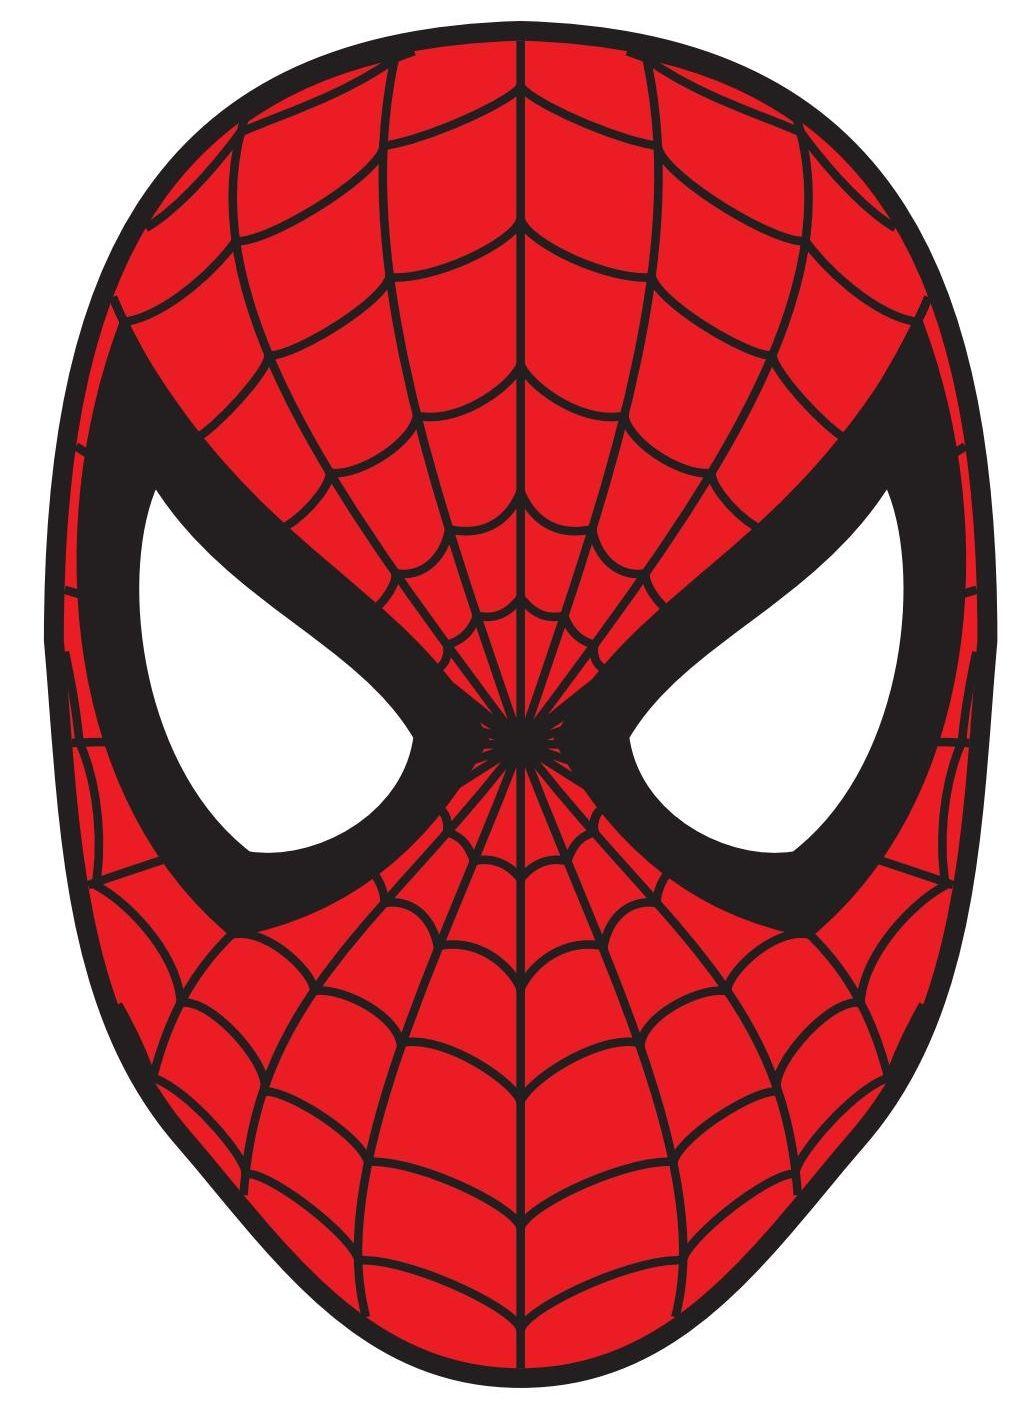 spiderman logo Google Search Cartoon clip art